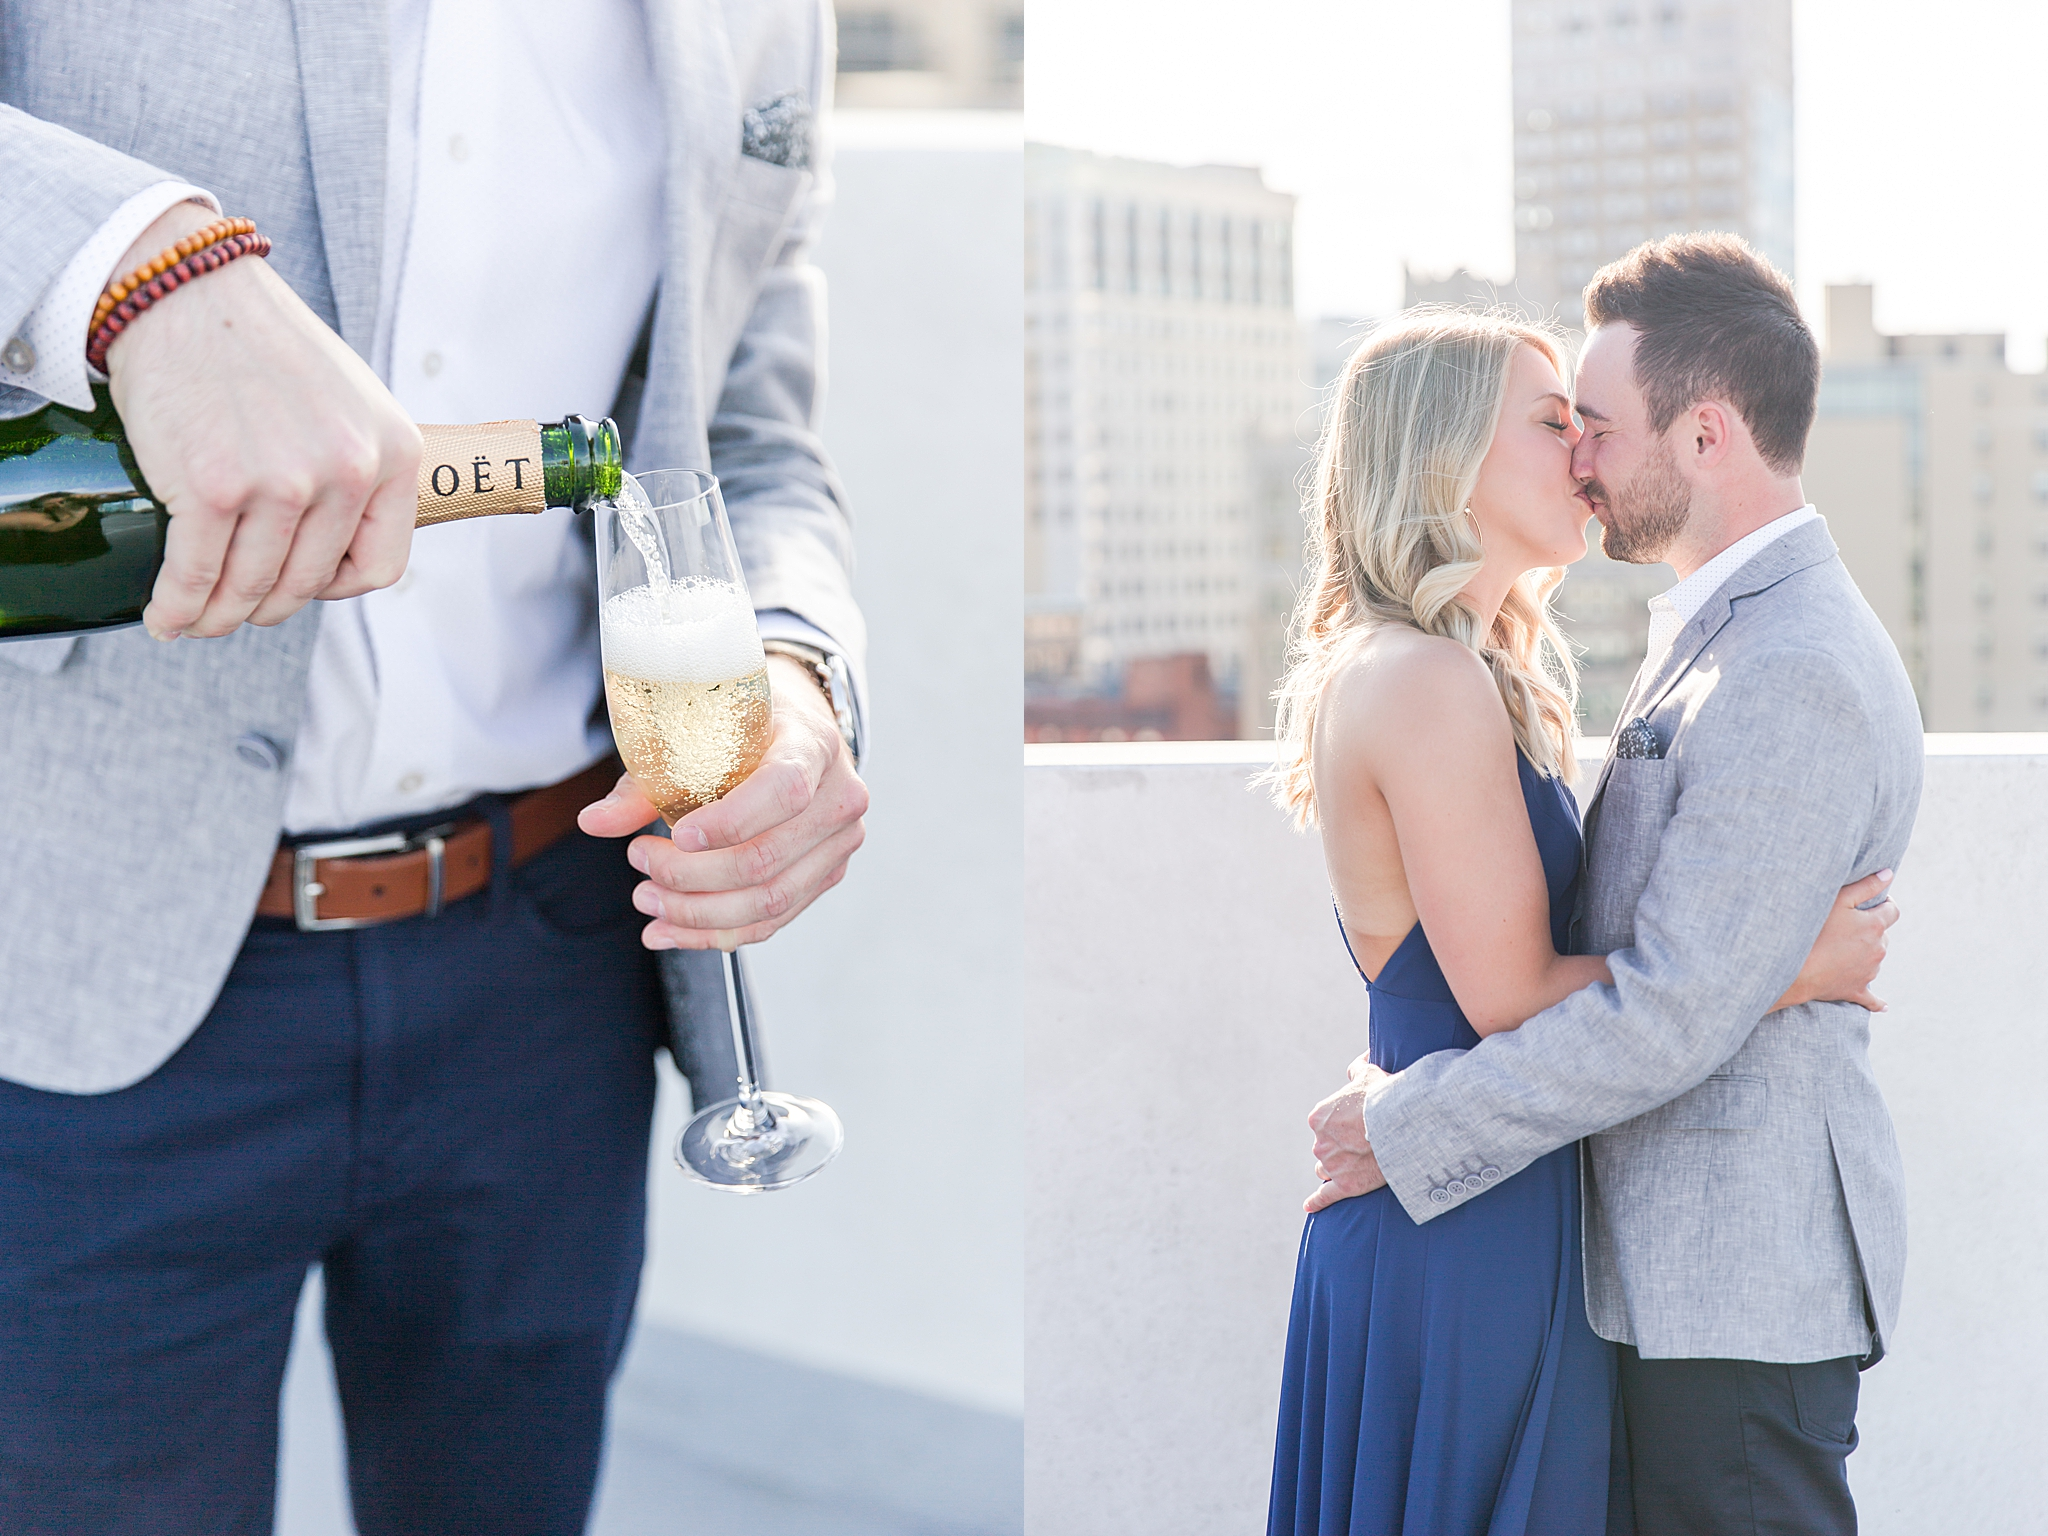 detroit-wedding-photographer-downtown-detroit-belle-isle-engagement-photos-sarah-eric-by-courtney-carolyn-photography_0008.jpg